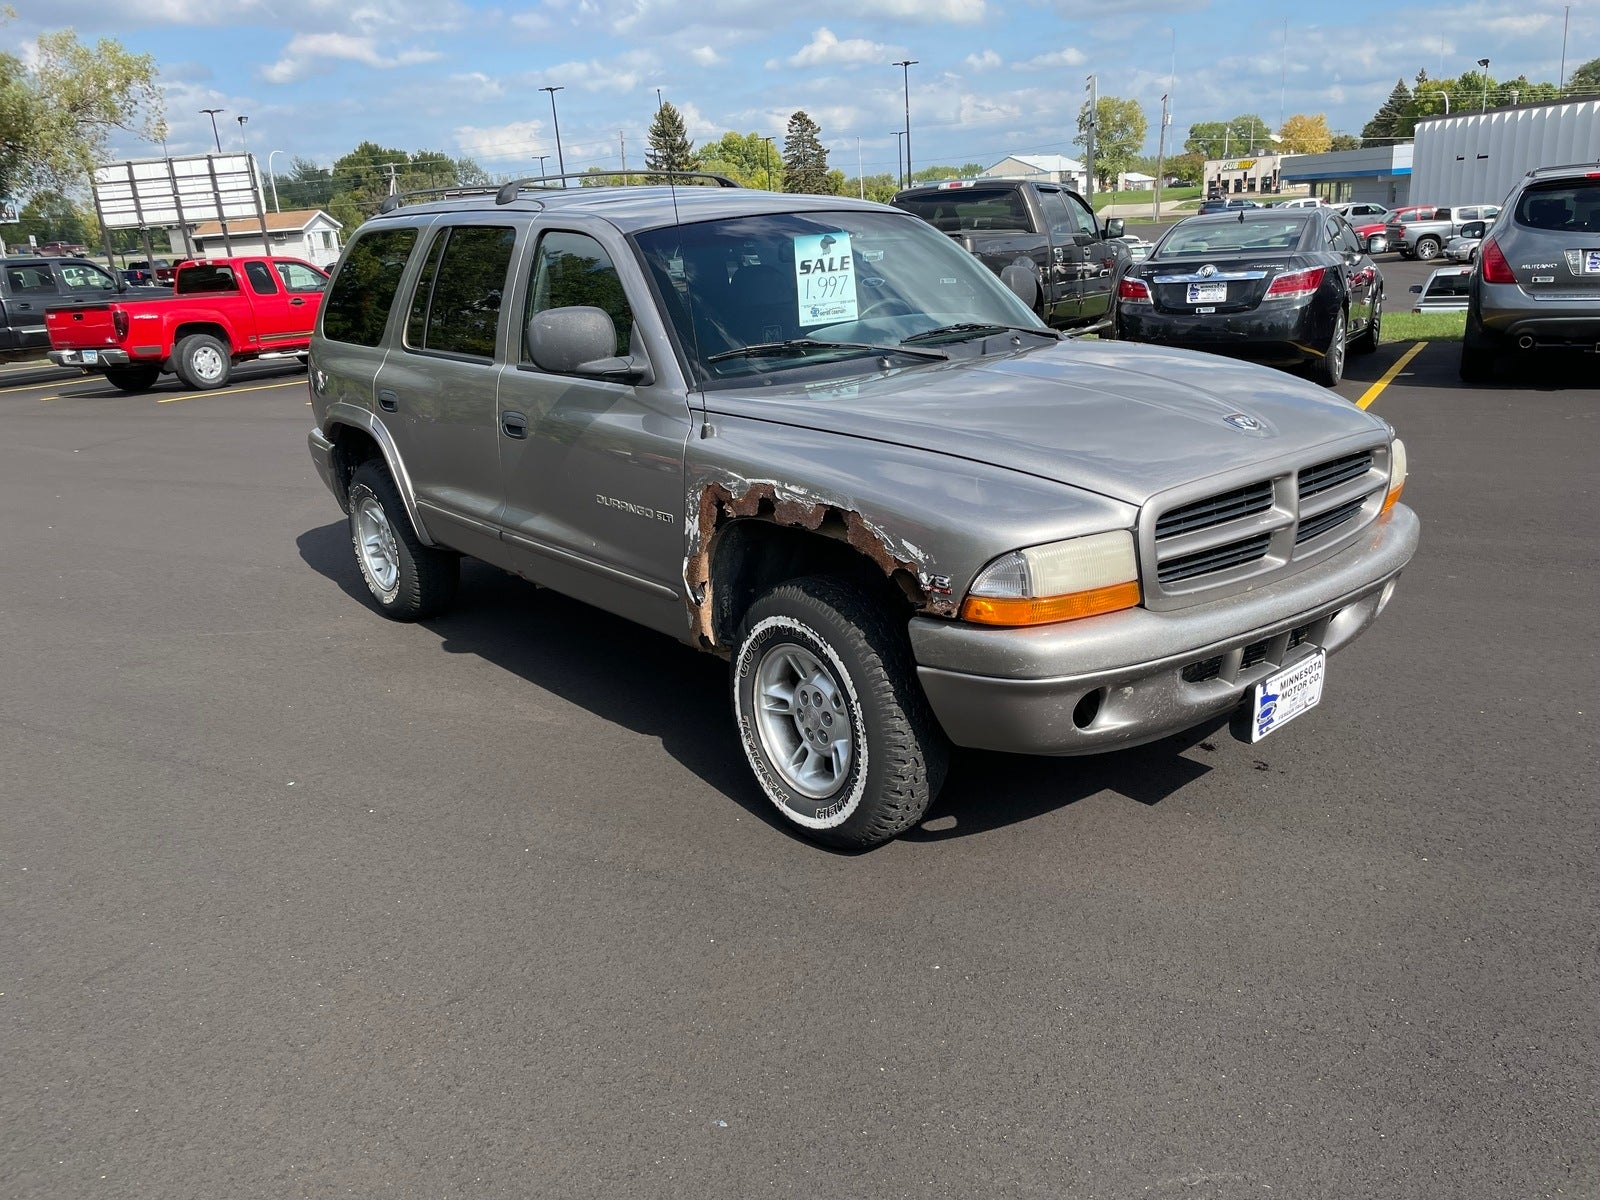 Used 1999 Dodge Durango SLT with VIN 1B4HS28Y8XF685629 for sale in Fergus Falls, Minnesota